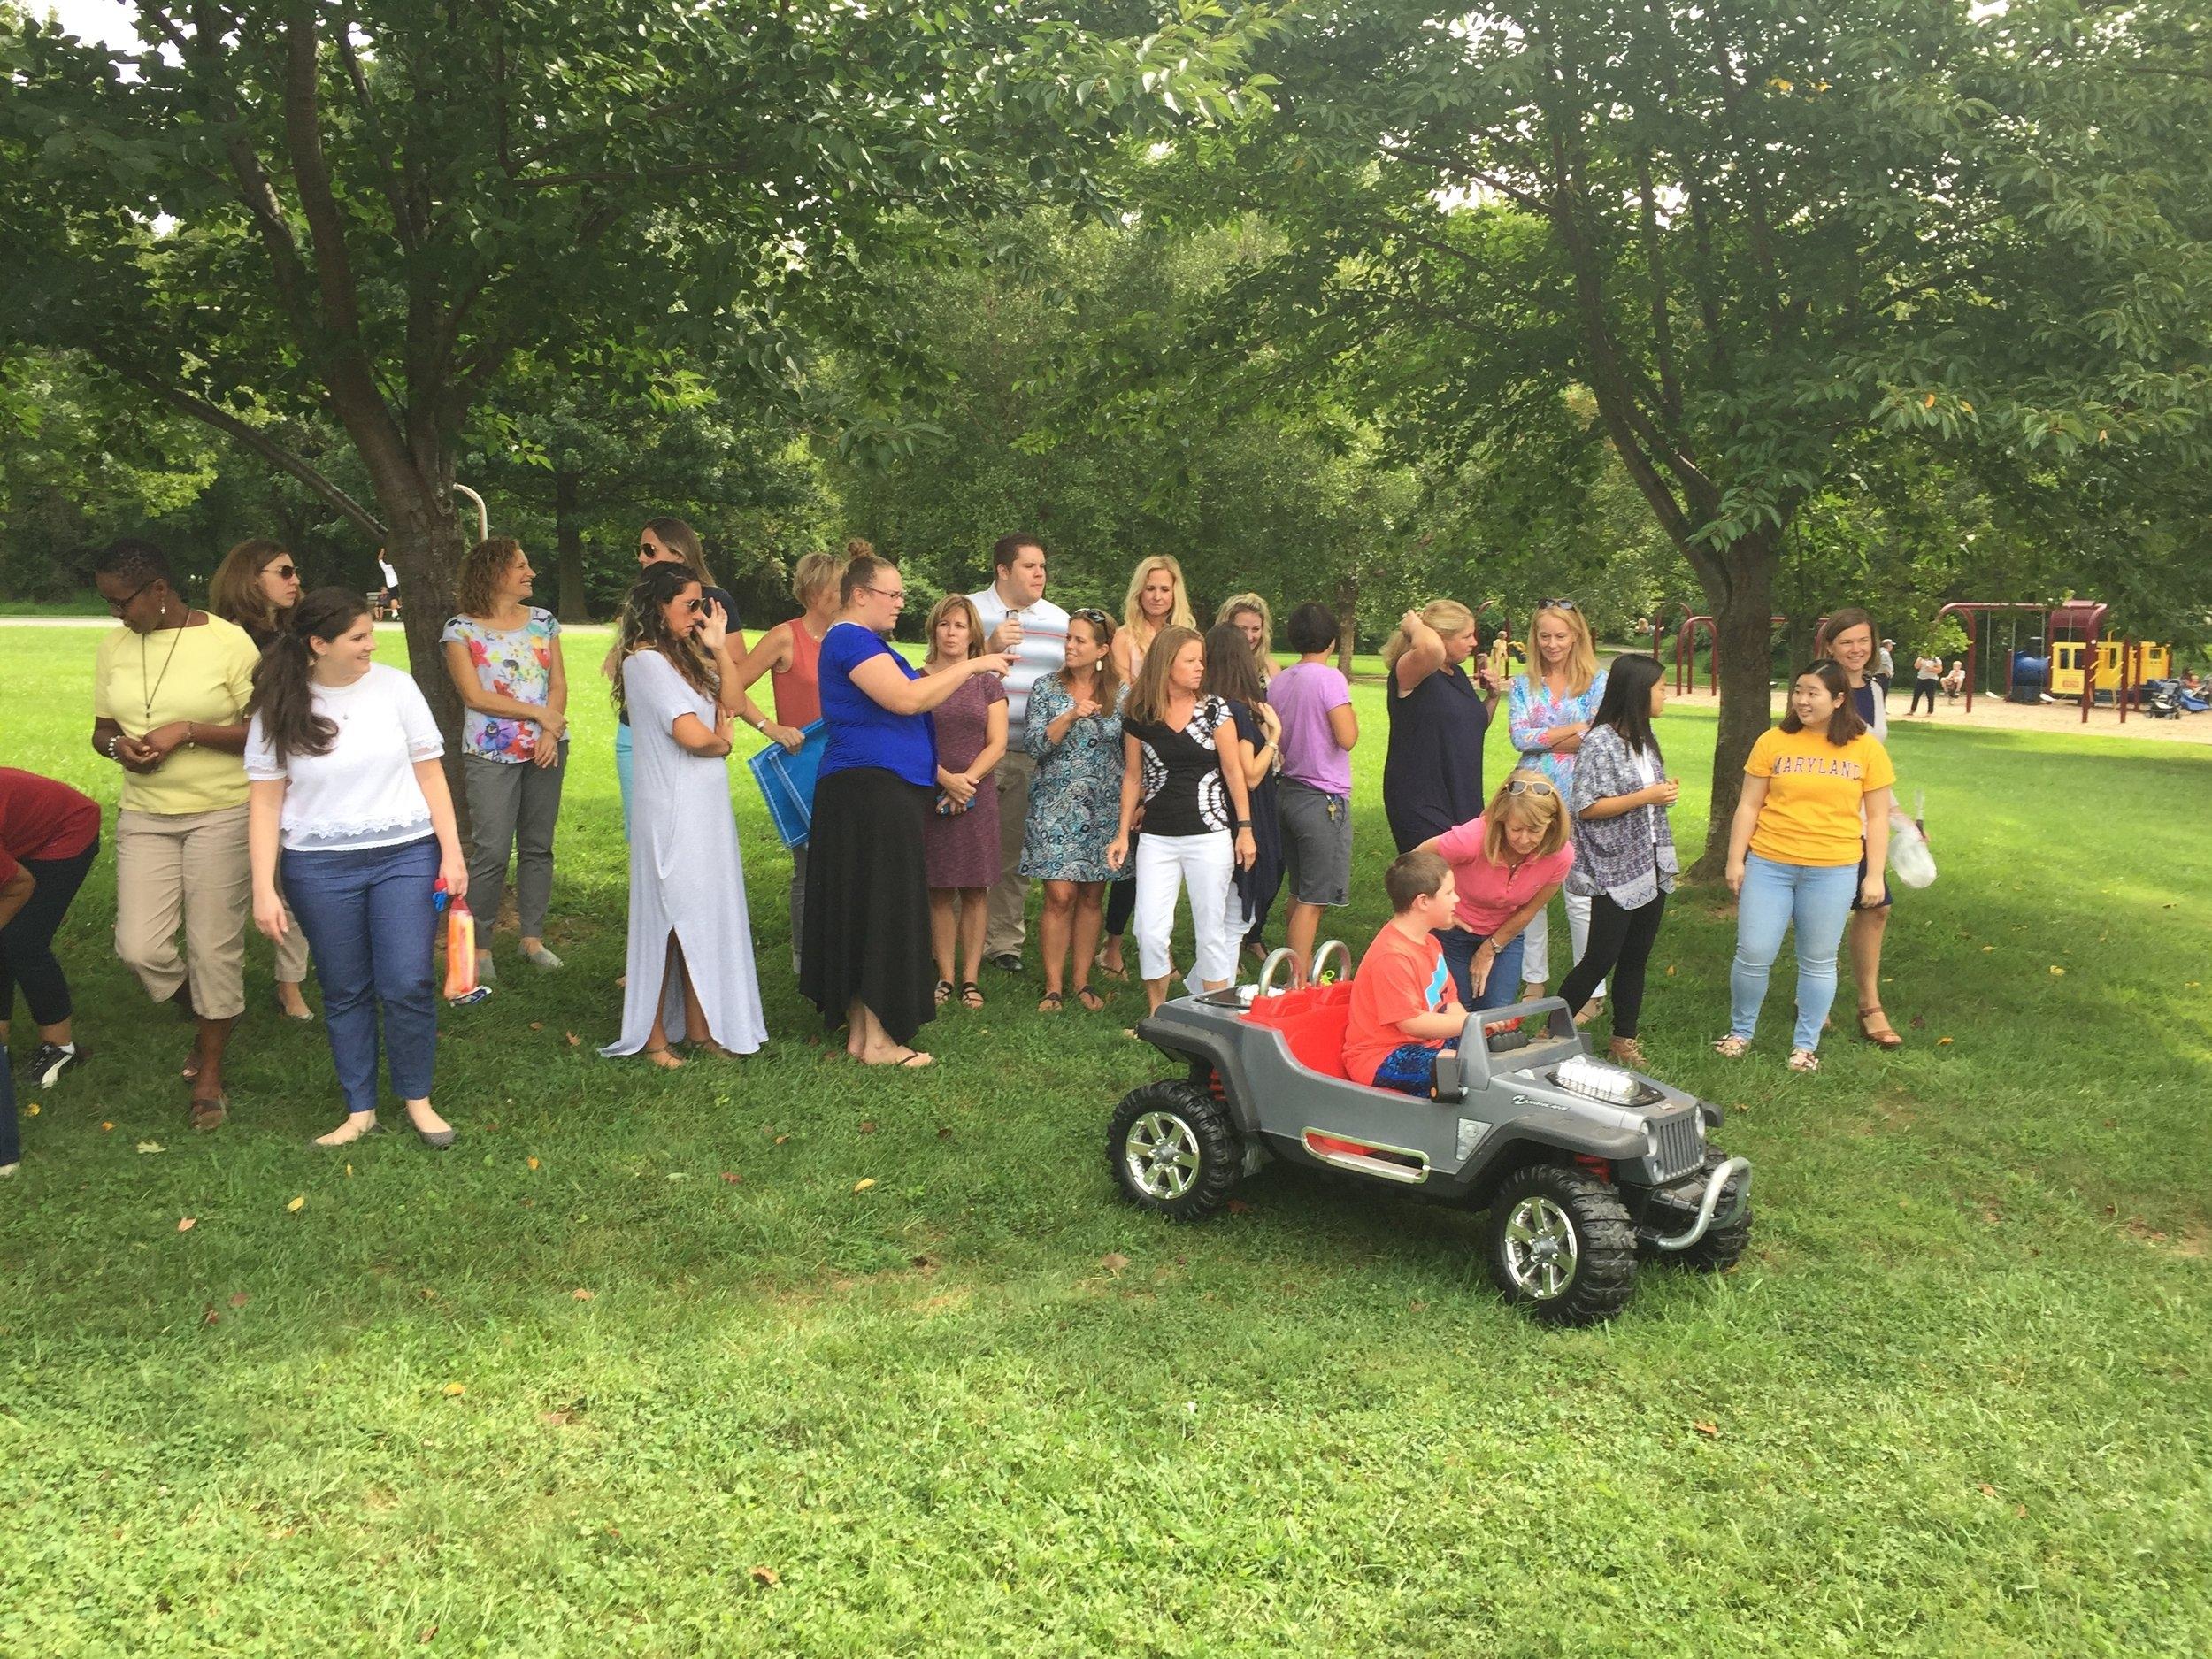 Teachers' Bus Tour - meet & greet @ Cherrywood Park